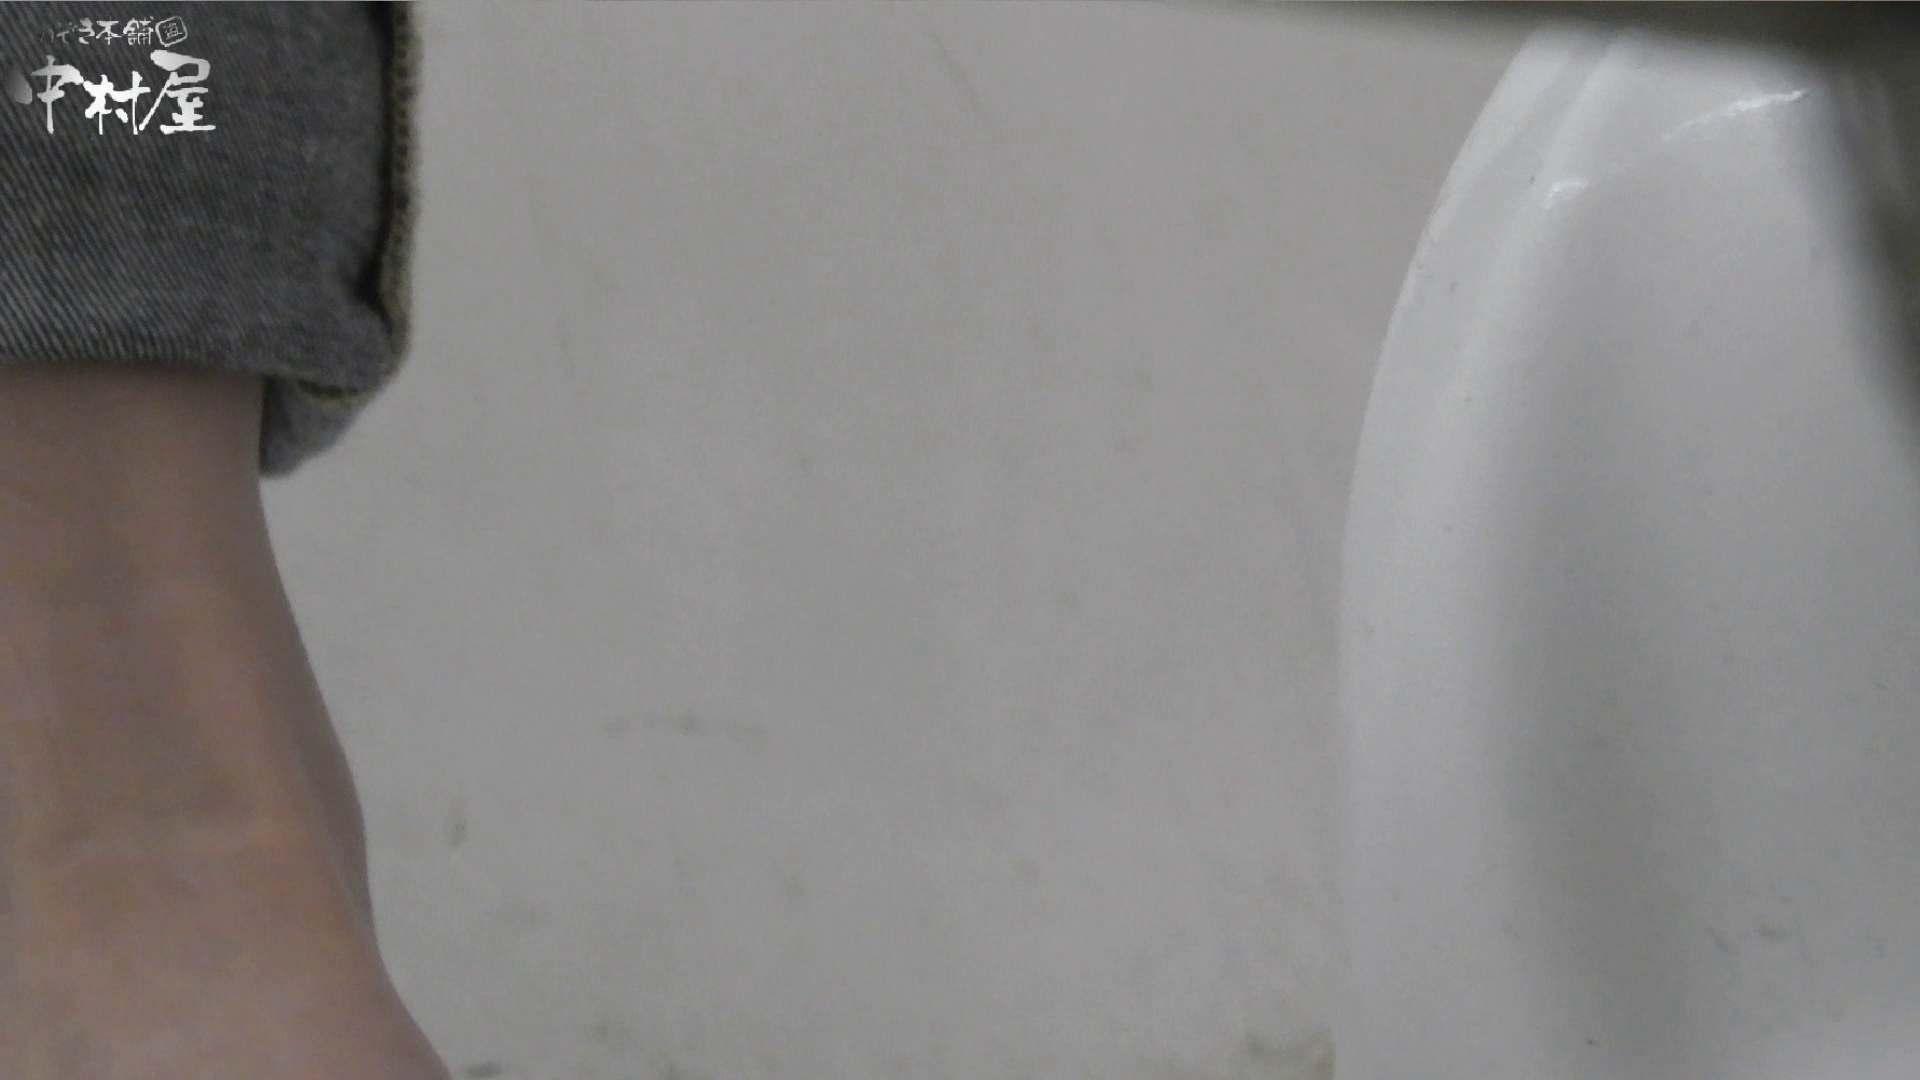 vol.42 命がけ潜伏洗面所! カカト上げながら・硬度強(太)・180g HなOL セックス無修正動画無料 79pic 68